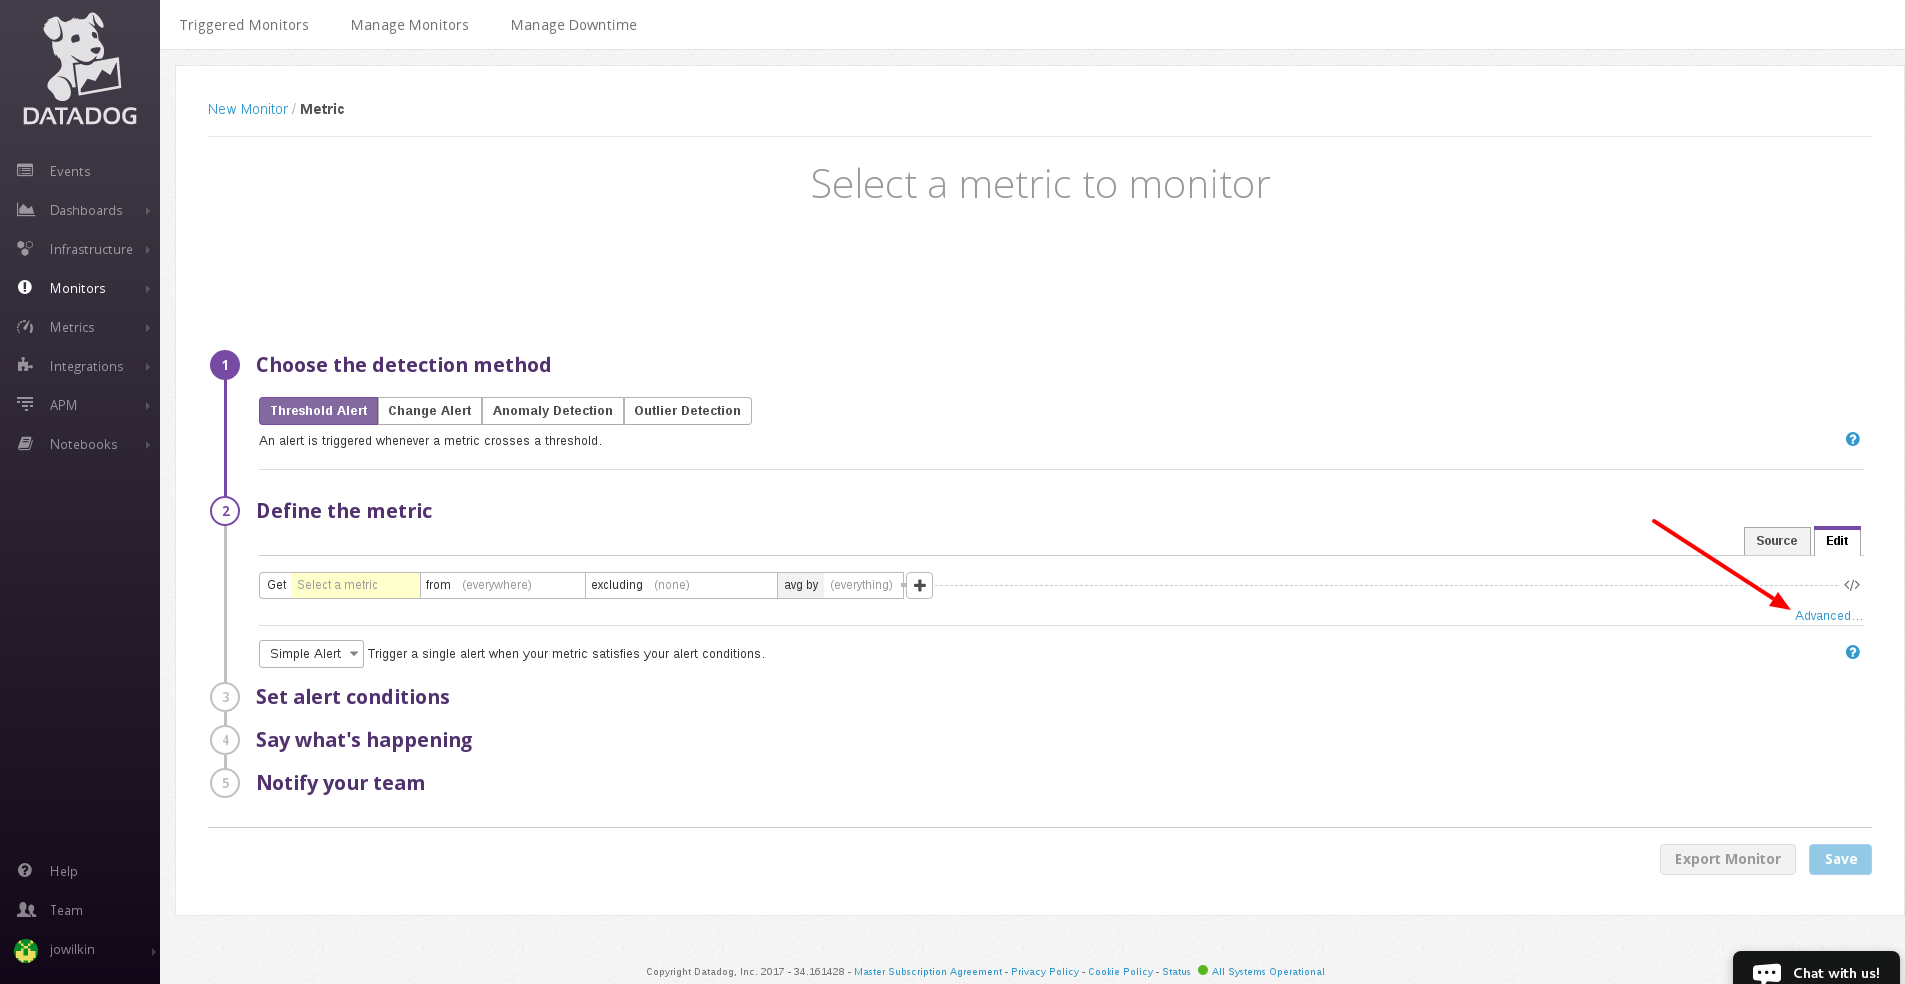 datadog new monitor